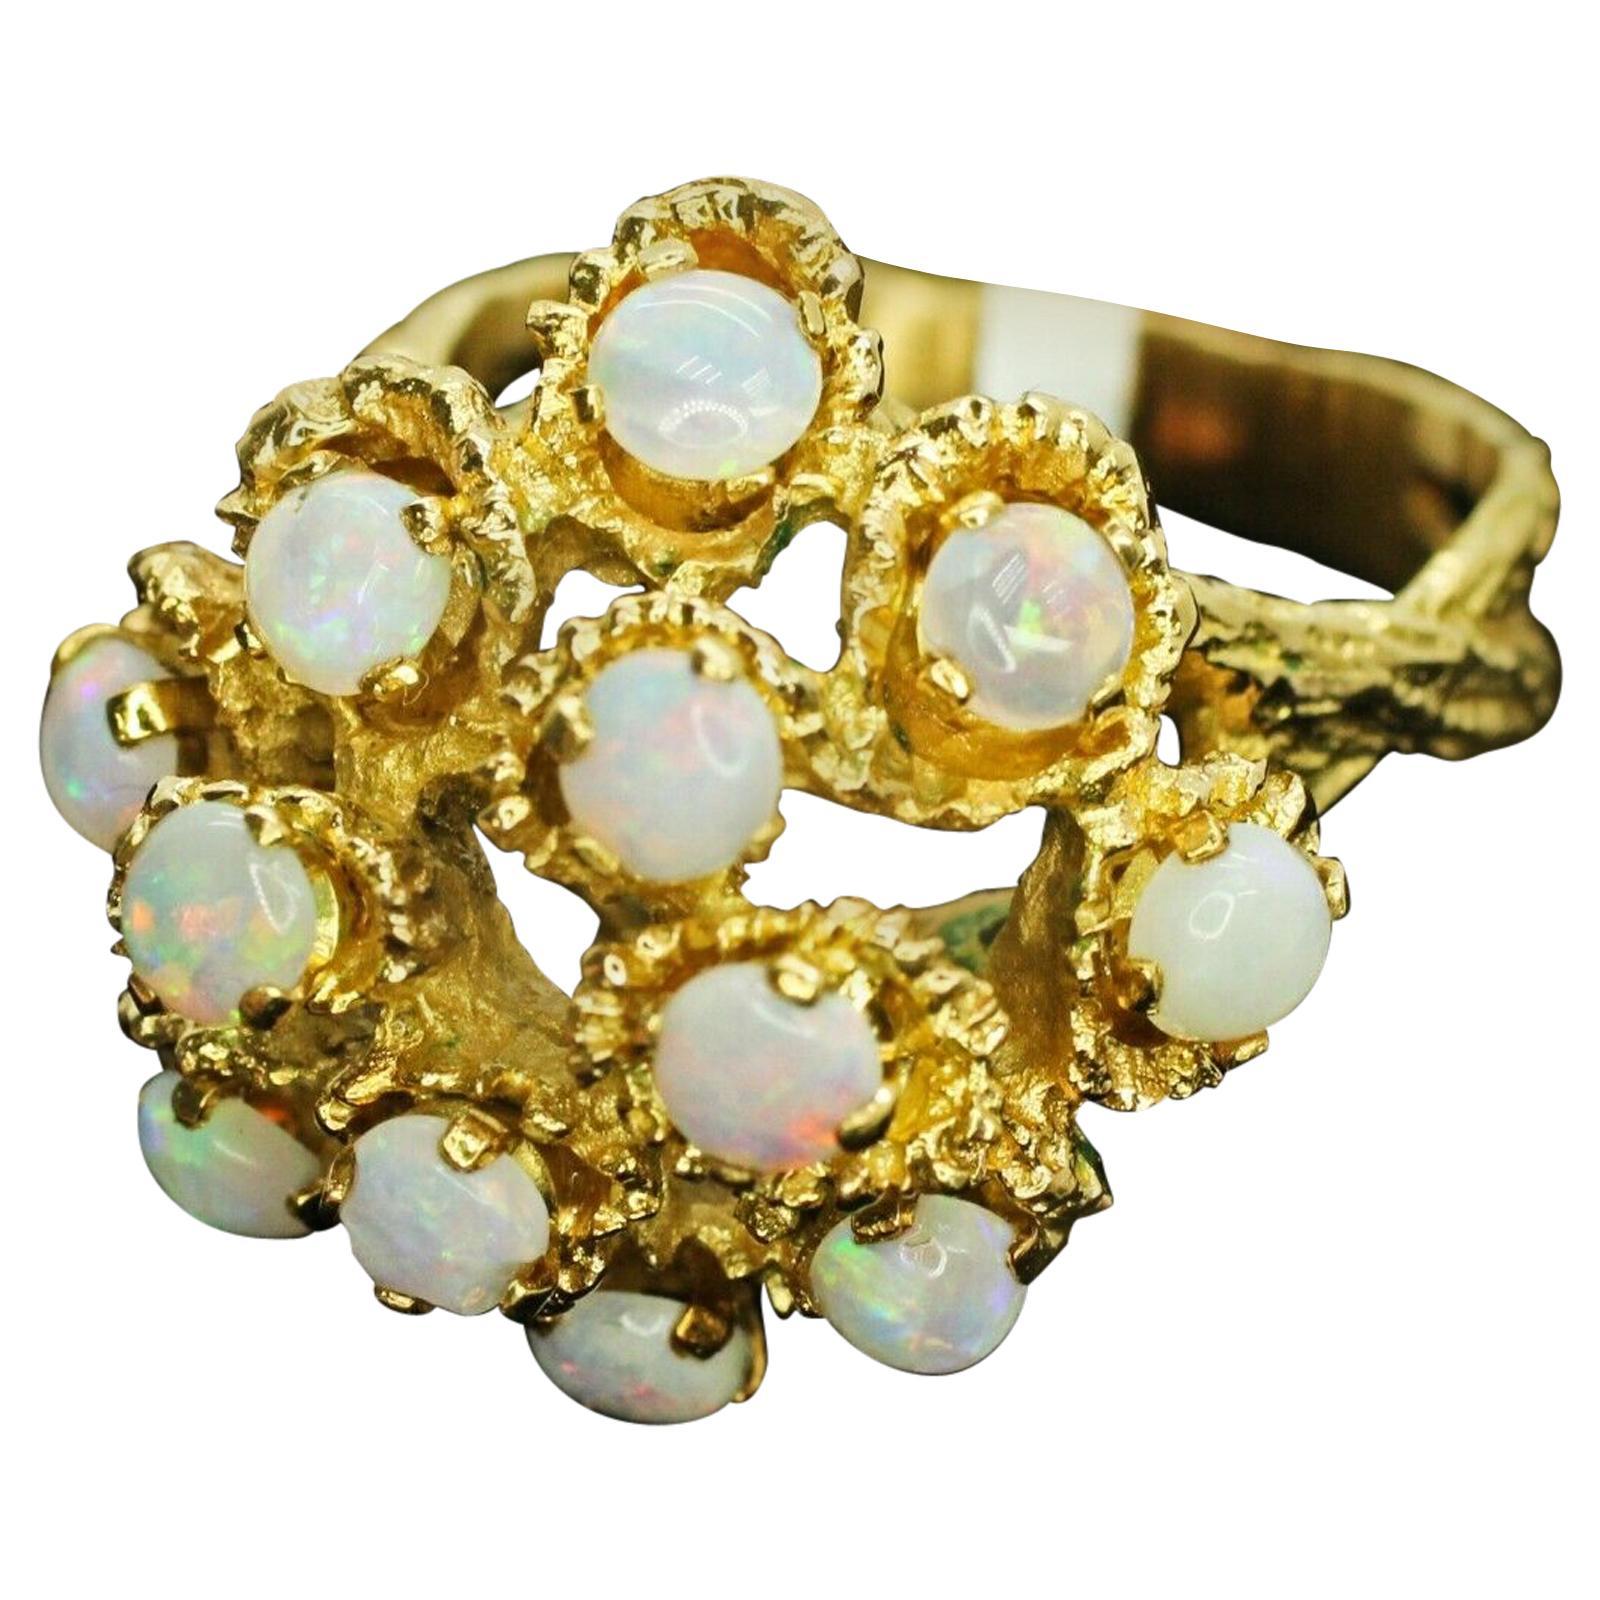 18 Karat Yellow Gold Opal Cluster Ring